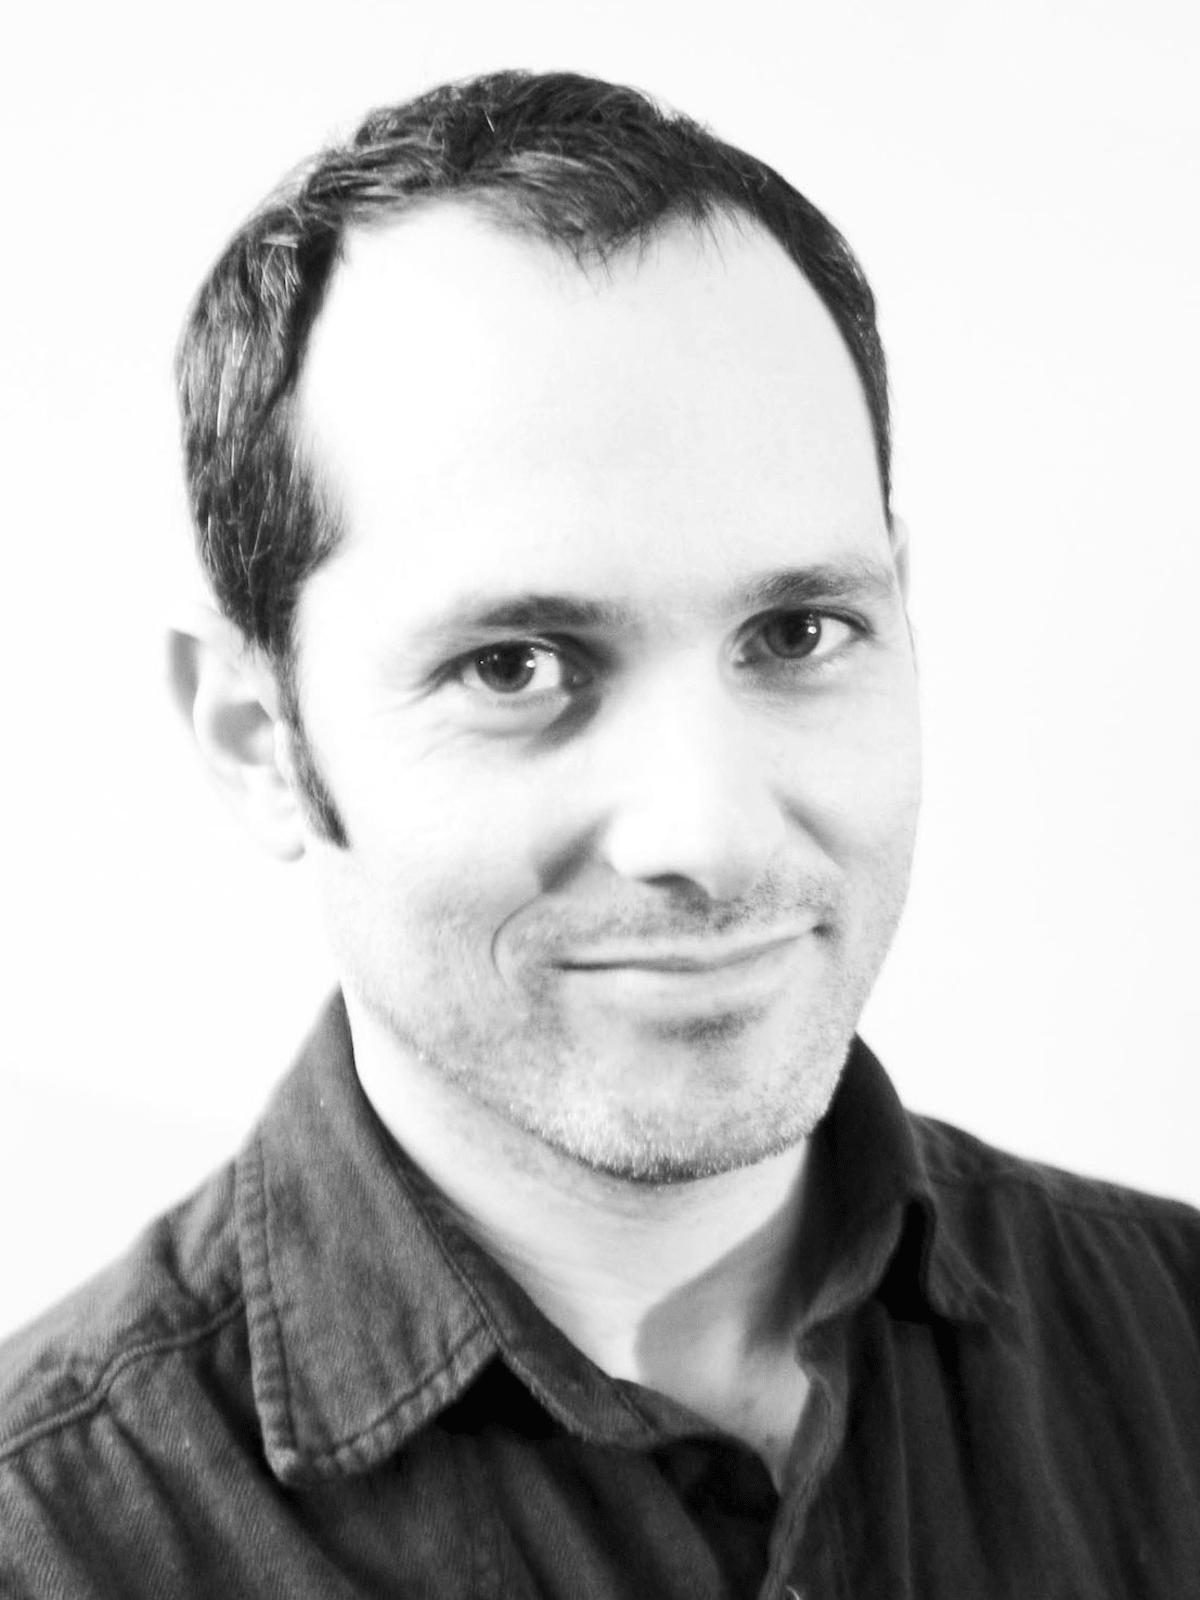 News_Douglas Newman_new head shot_Jan. 2010_black and white